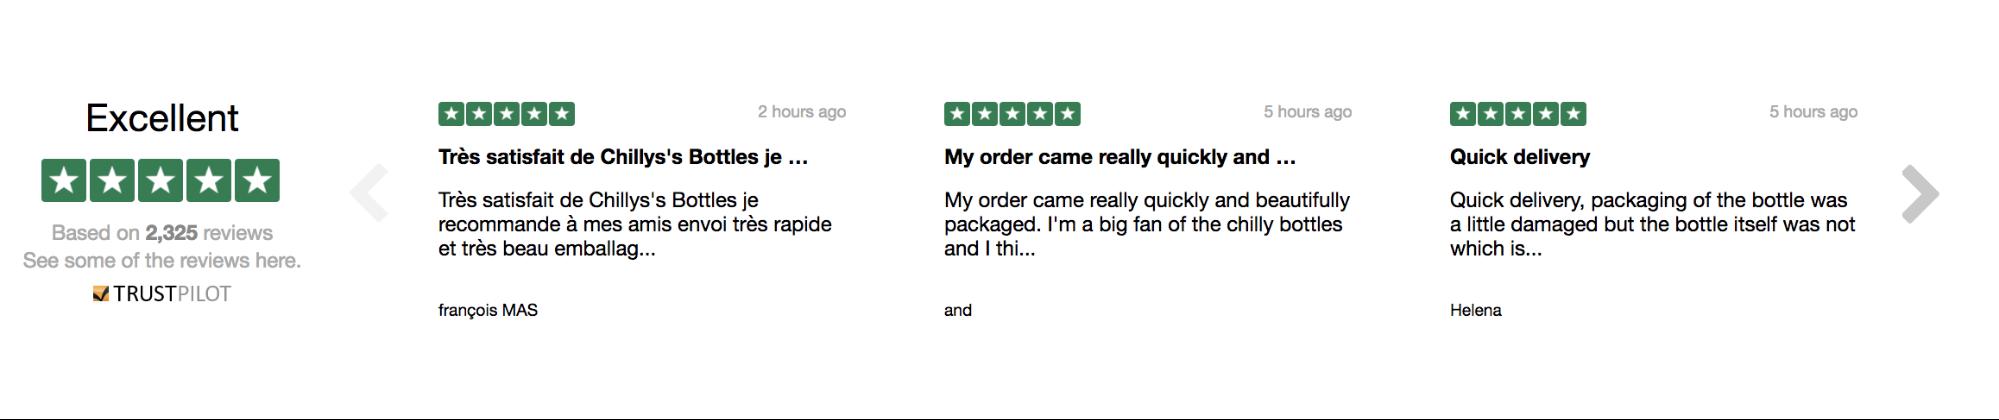 Screenshot showing reviews for a website